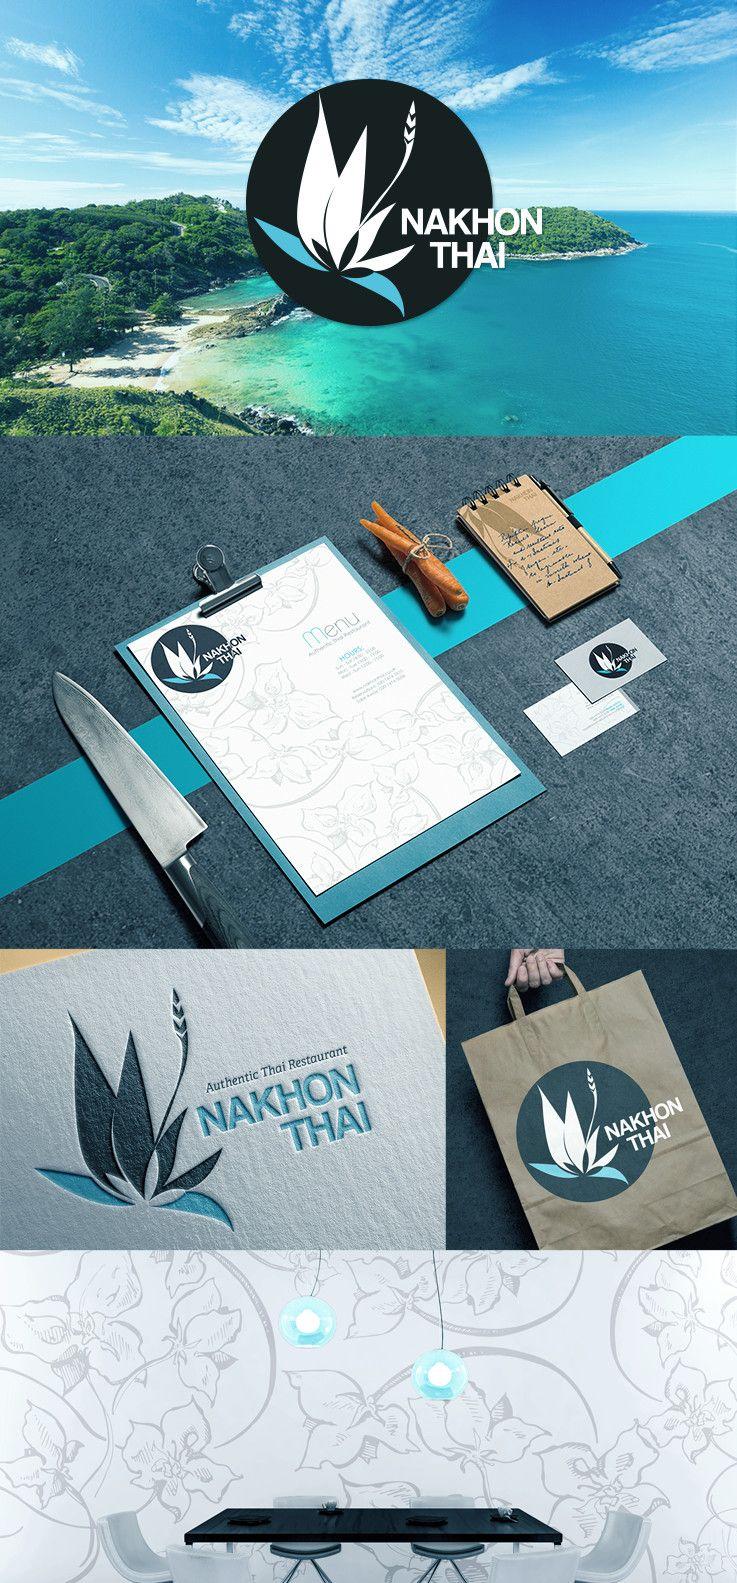 Restaurant designs restaurant logo creator restaurant logo maker - Thai Restaurant Re Brand Logo Branding Design